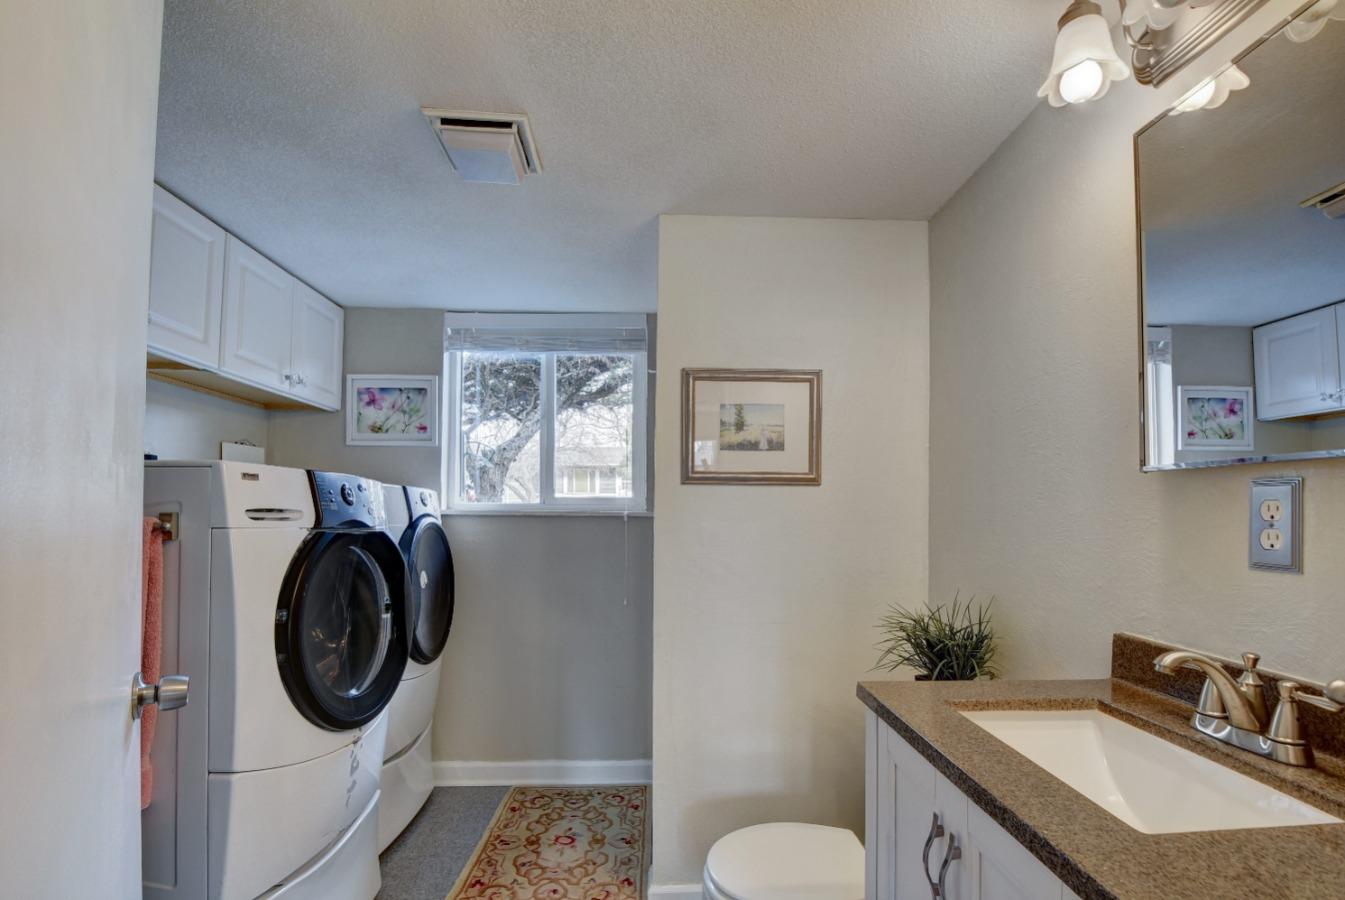 Bathroom and Laundry Area